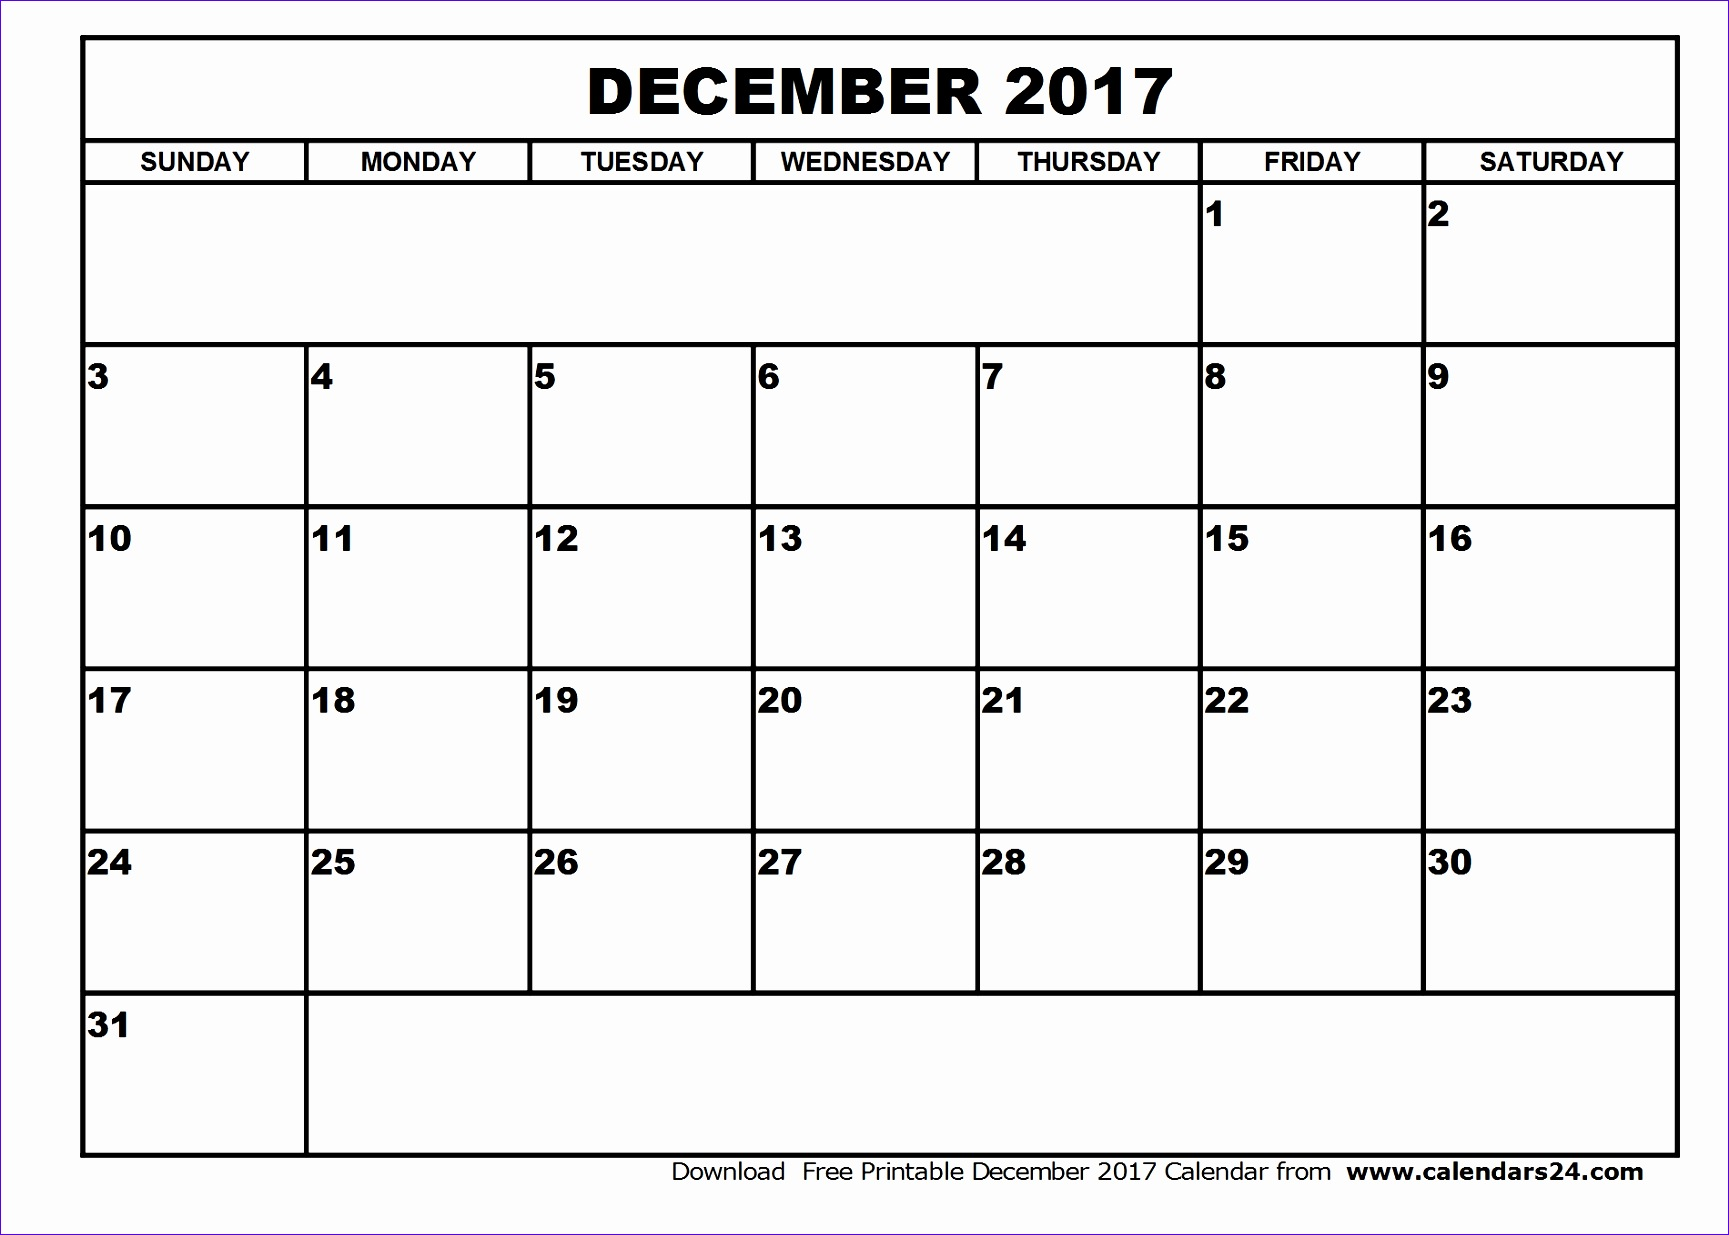 december 2017 calendar 1536 17291235